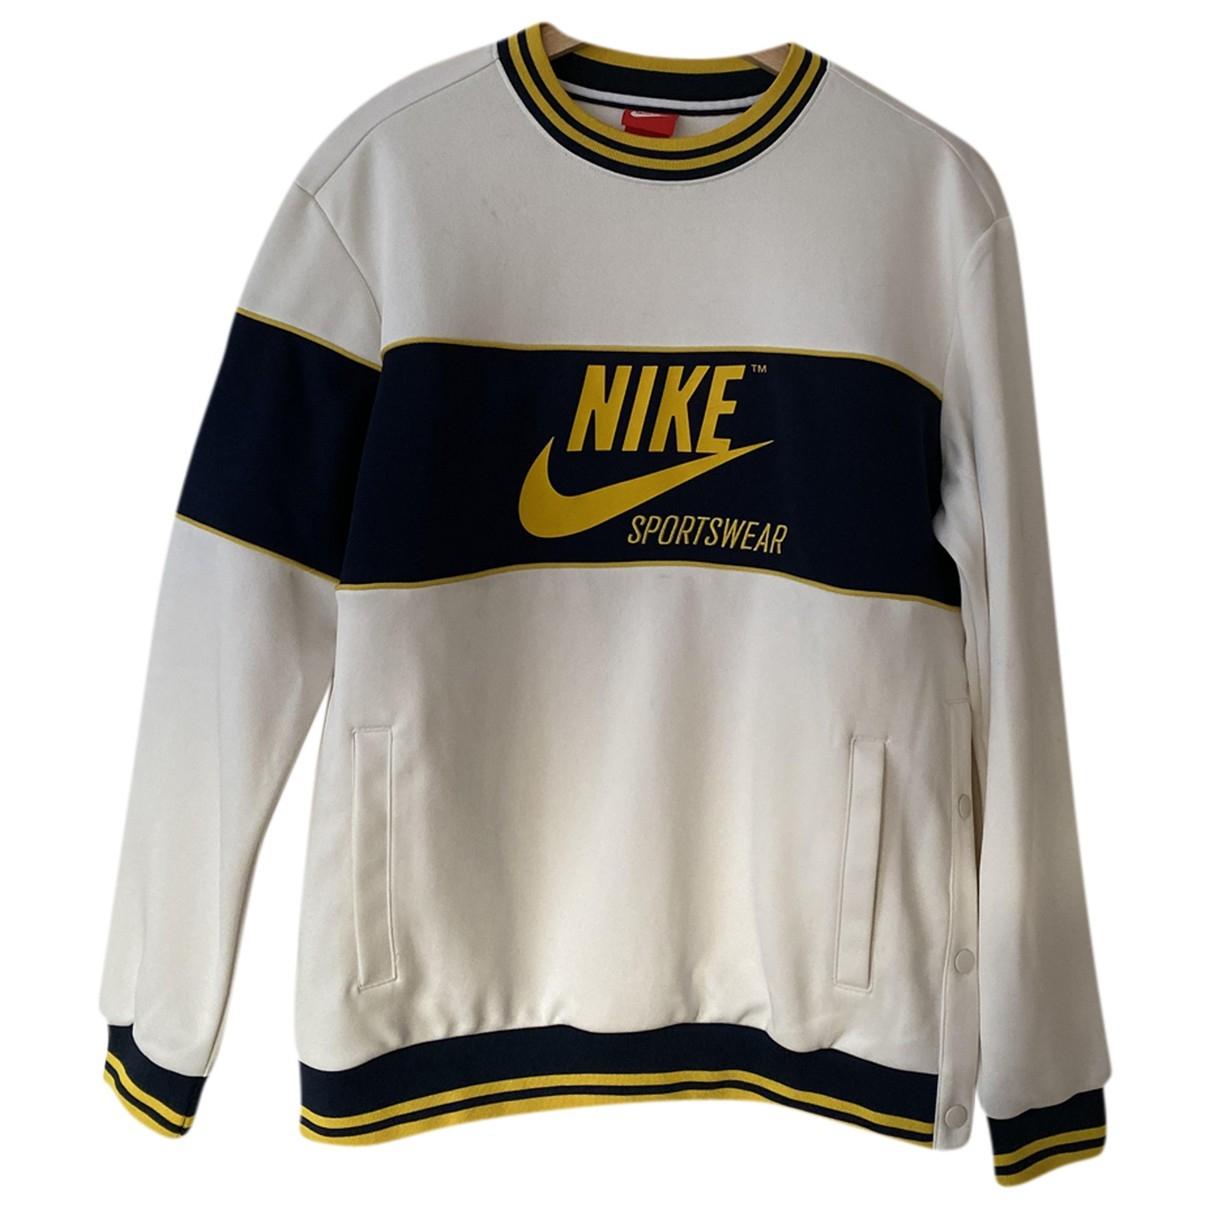 Nike \N White Knitwear & Sweatshirts for Men M International